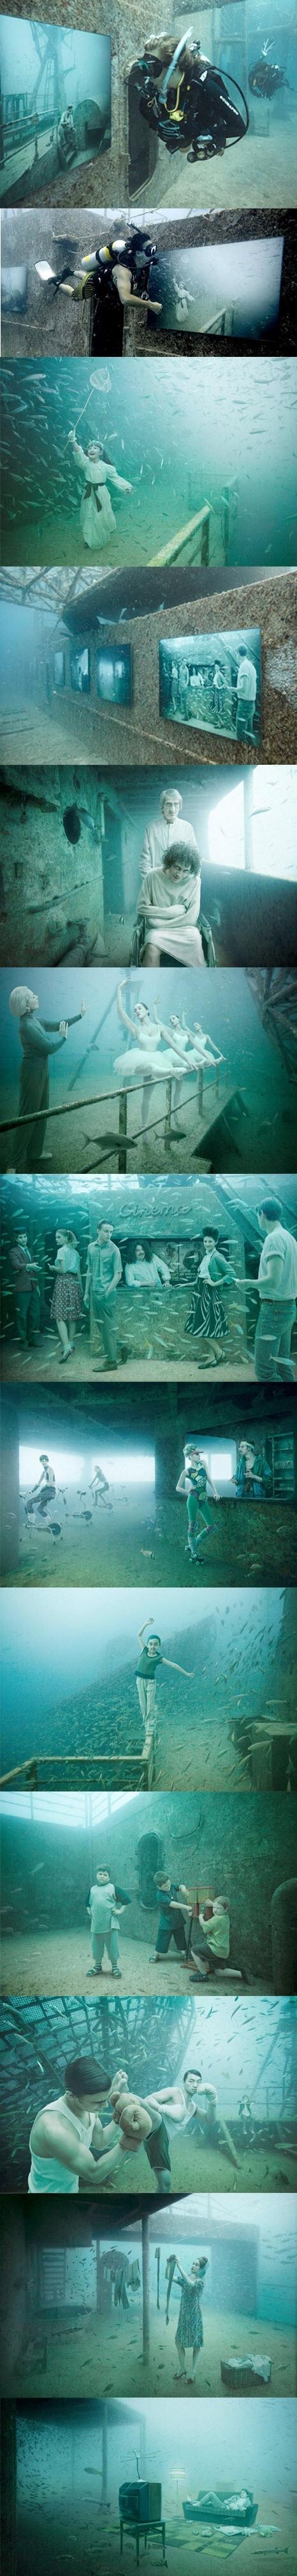 Astounding Wrecked Ship Underwater Art Gallery.